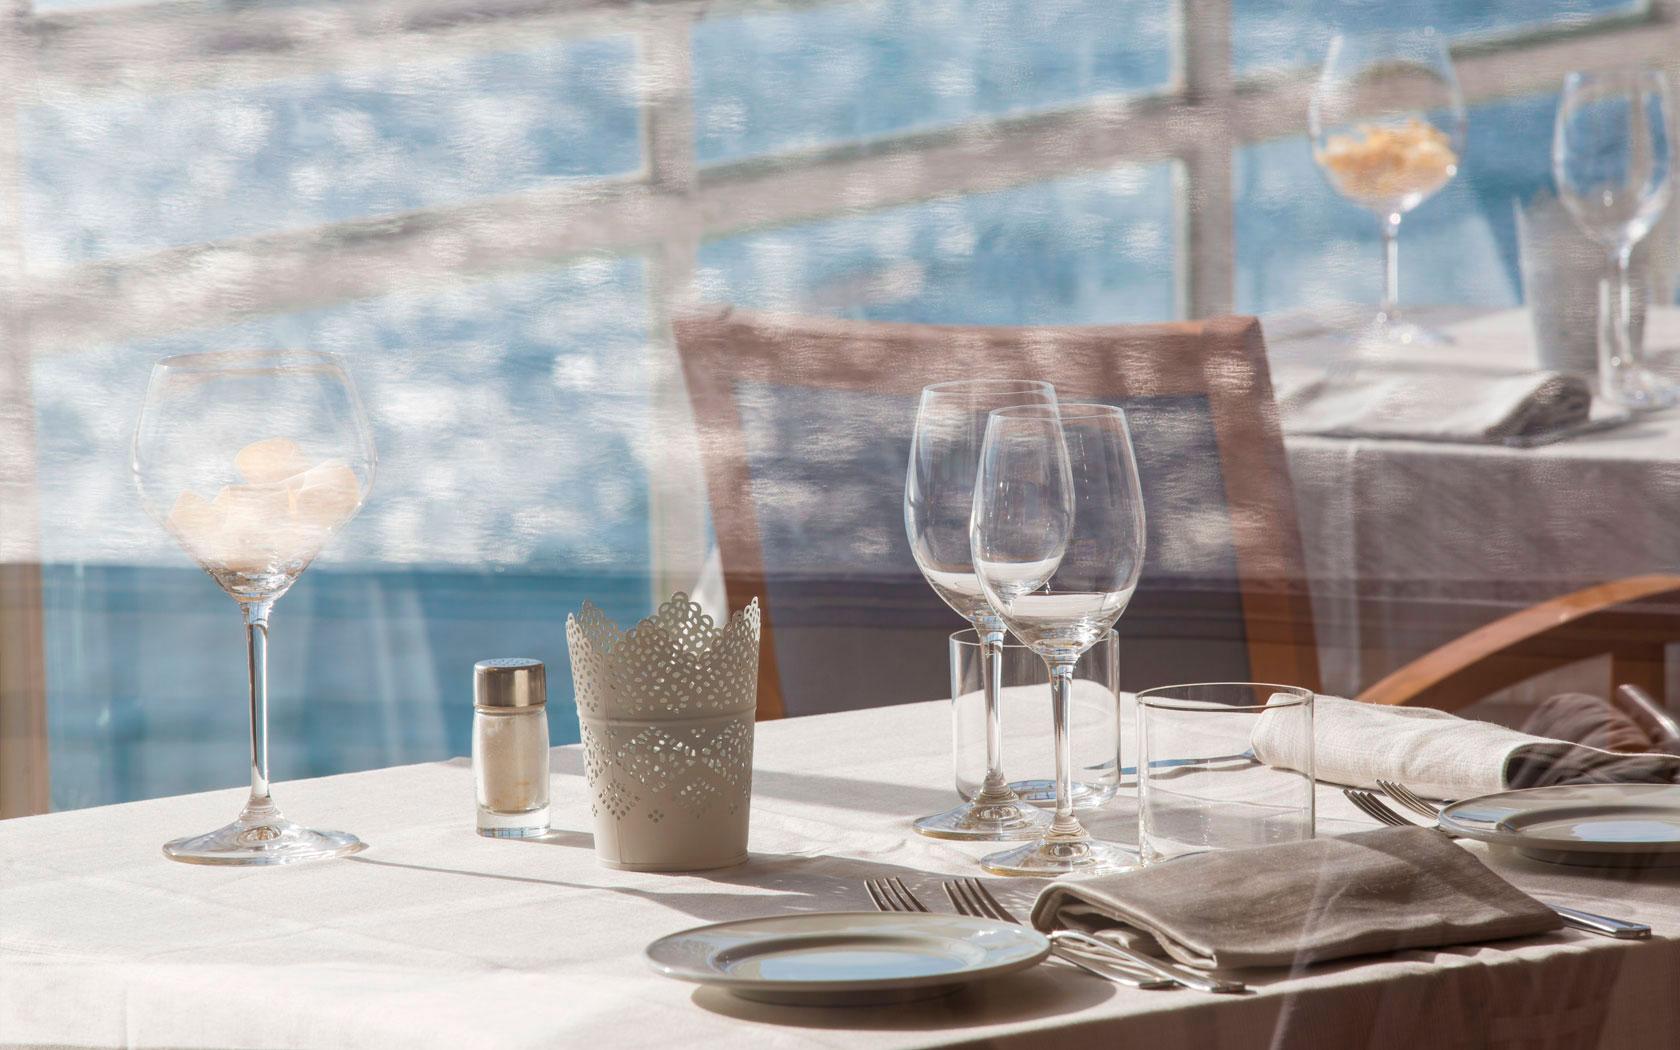 la cucina gourmet ad ischia al ristorante umberto a mare